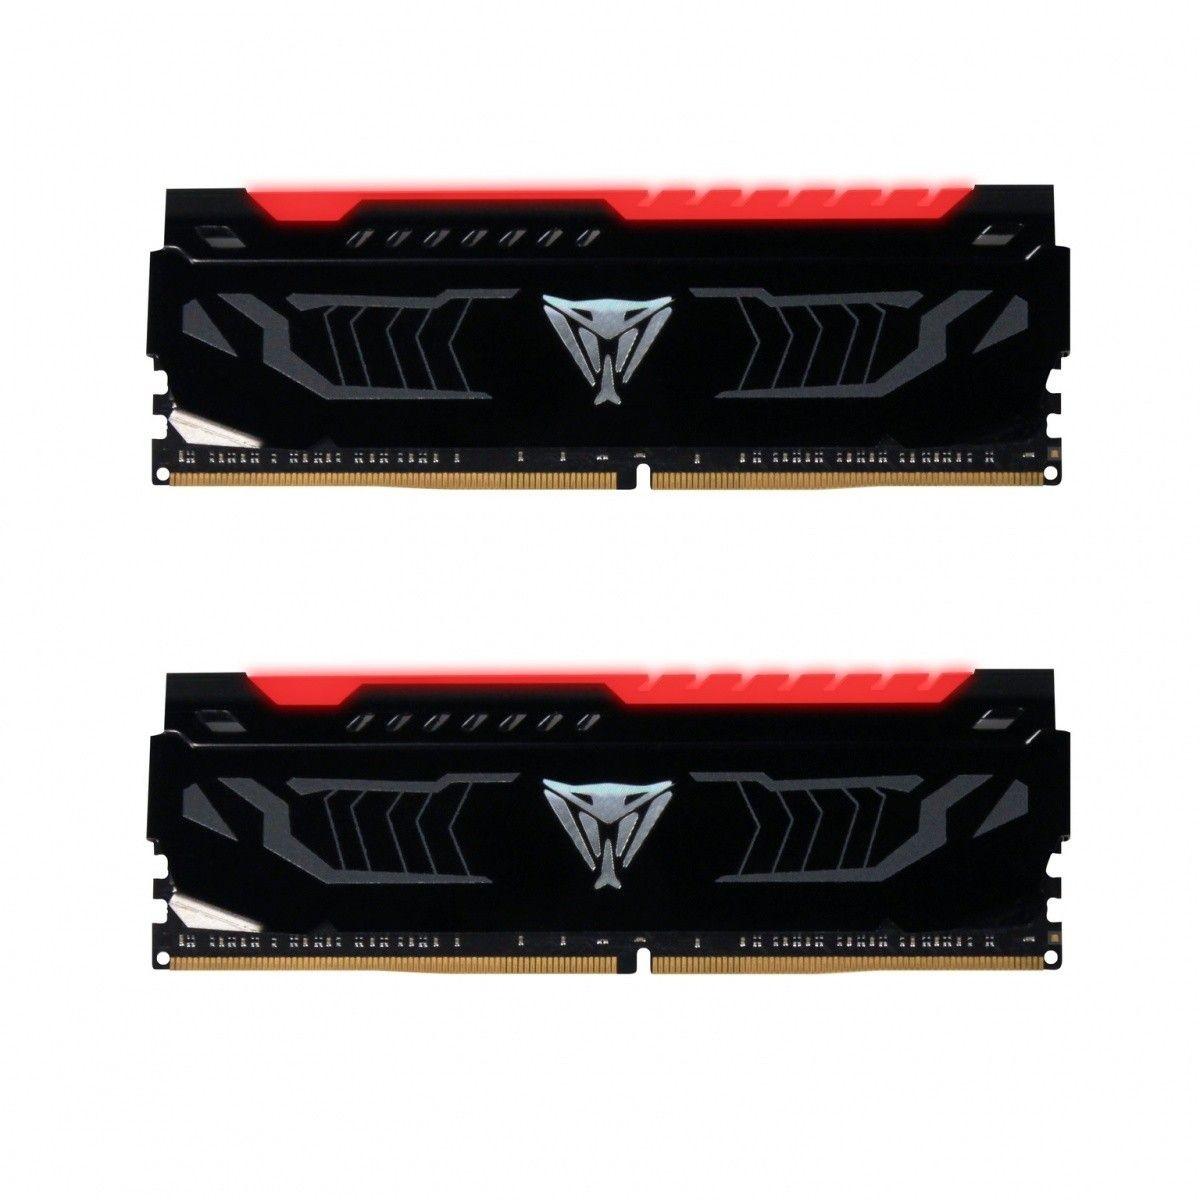 Patriot Extreme Performance Viper LED Series - DDR4 - 16 GB: 2 x 8 GB - DIMM 288-PIN - ungepuffert